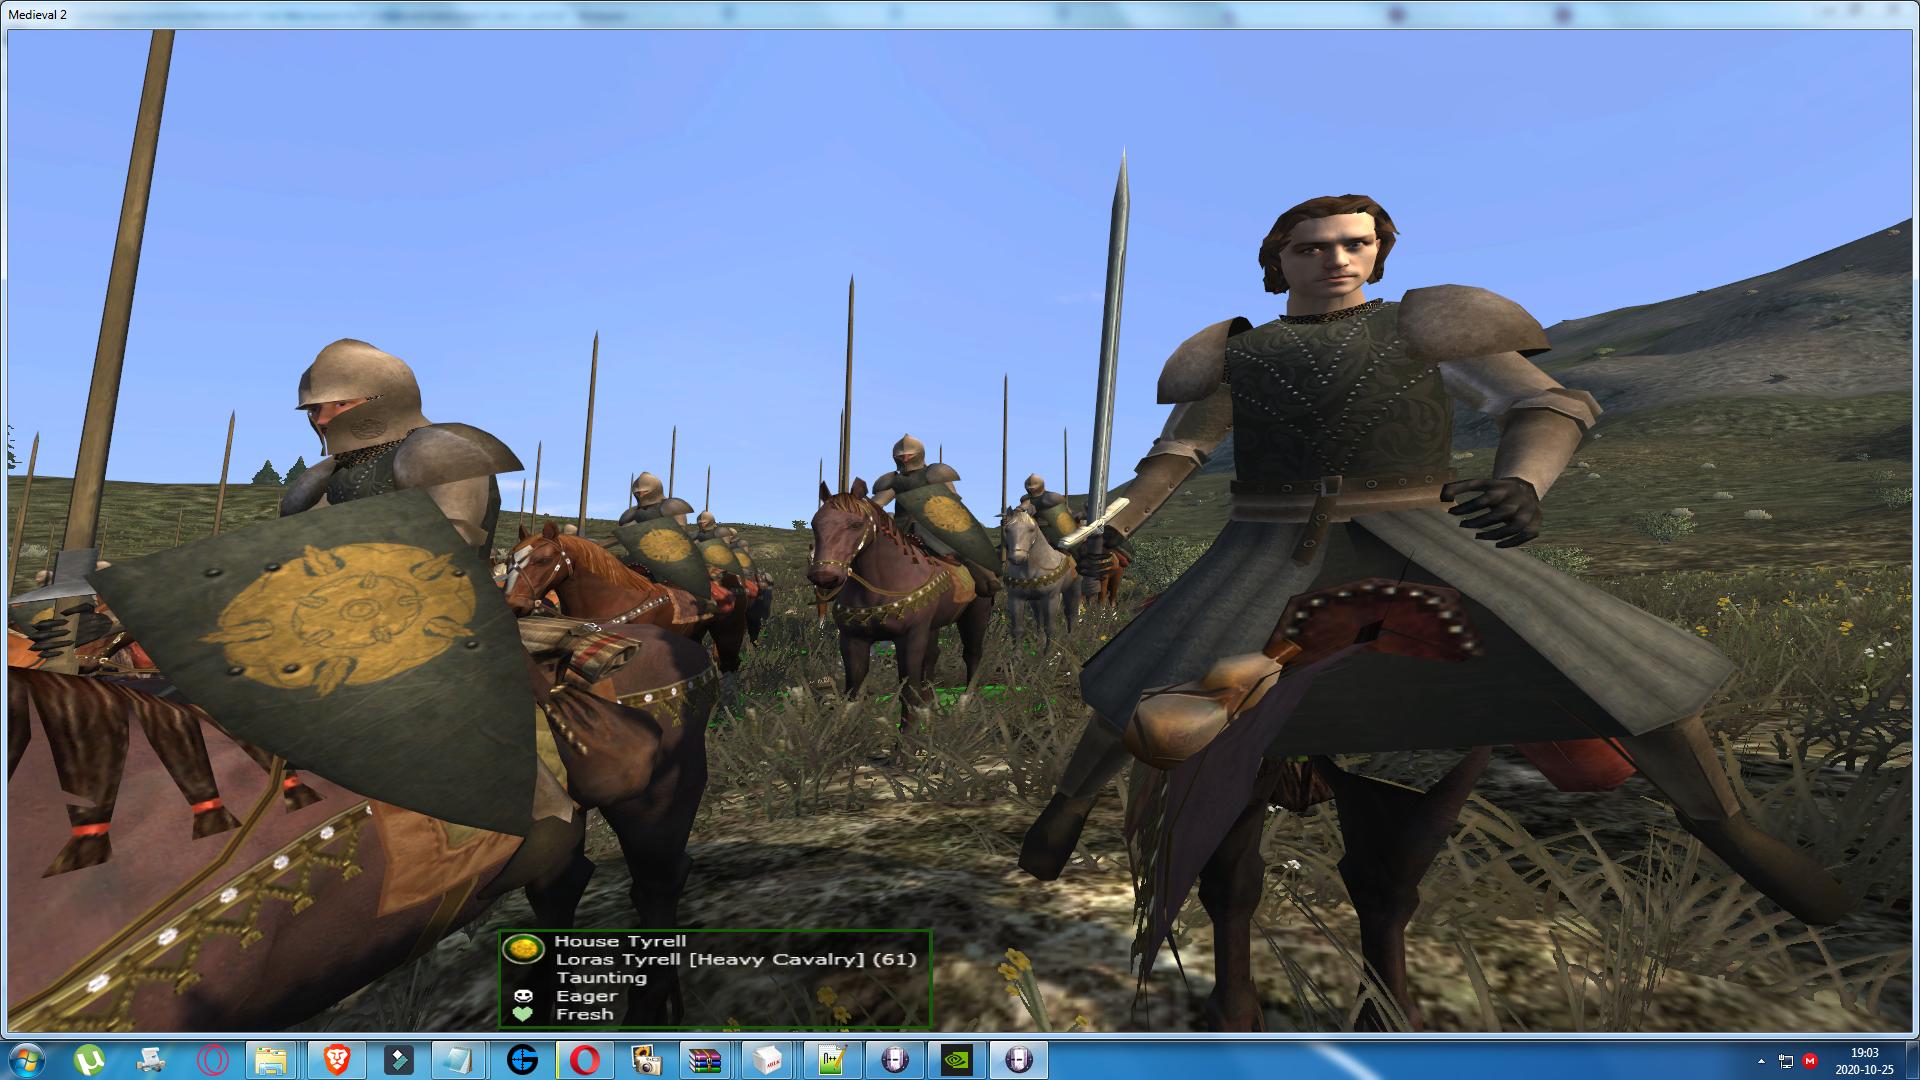 Sir Loras Tyrell has been added as a new custom hero!